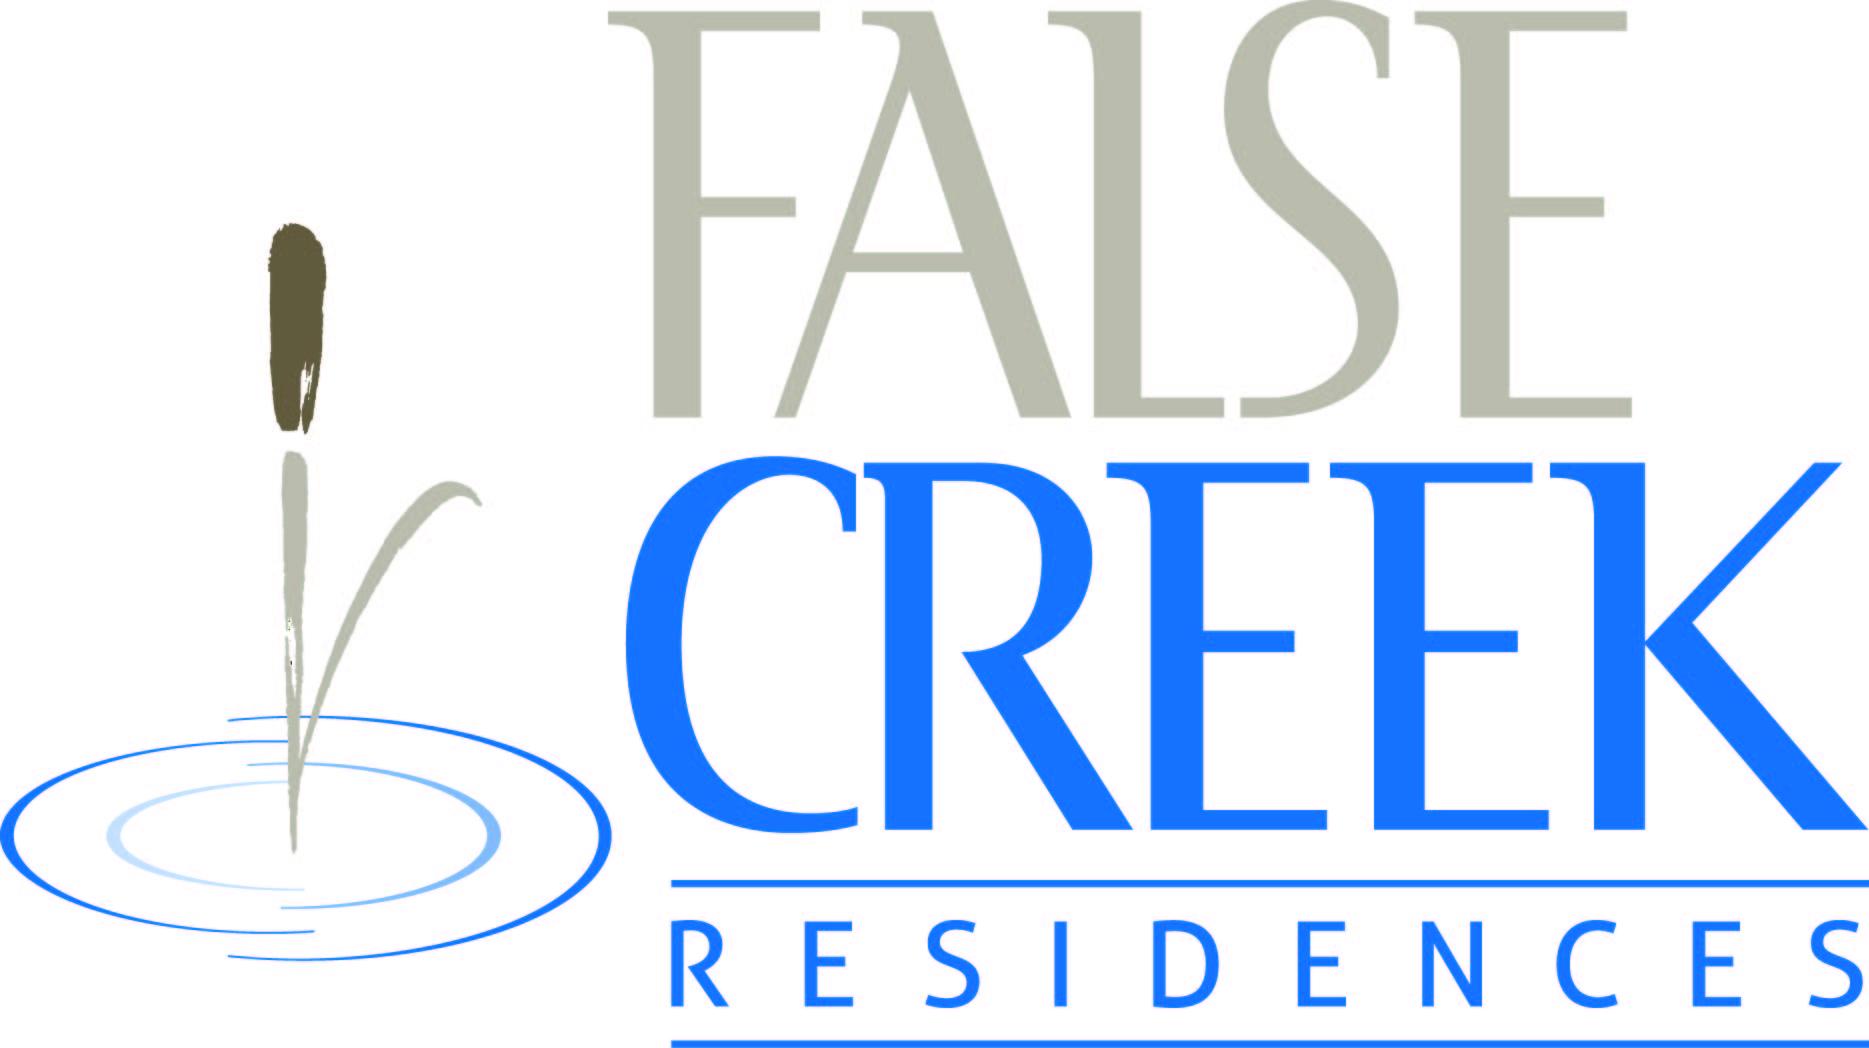 False Creek Residences